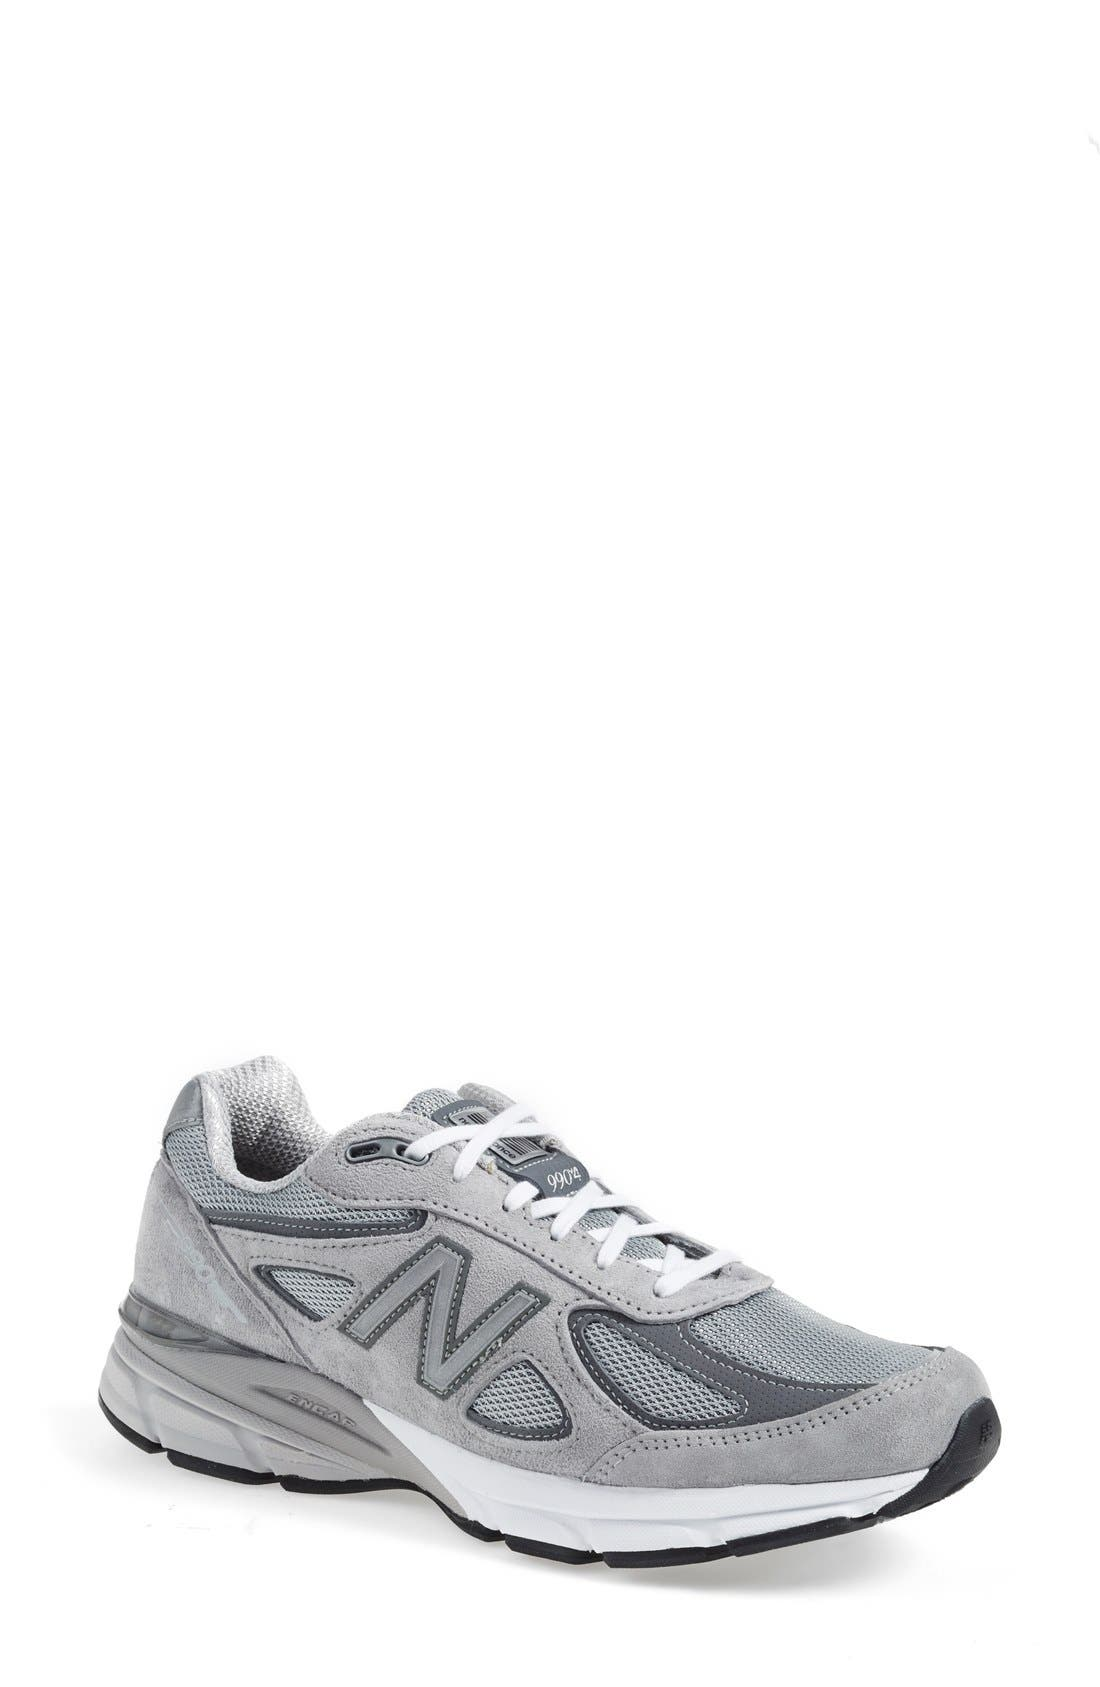 Main Image - New Balance \u0027990\u0027 Running Shoe (Men)